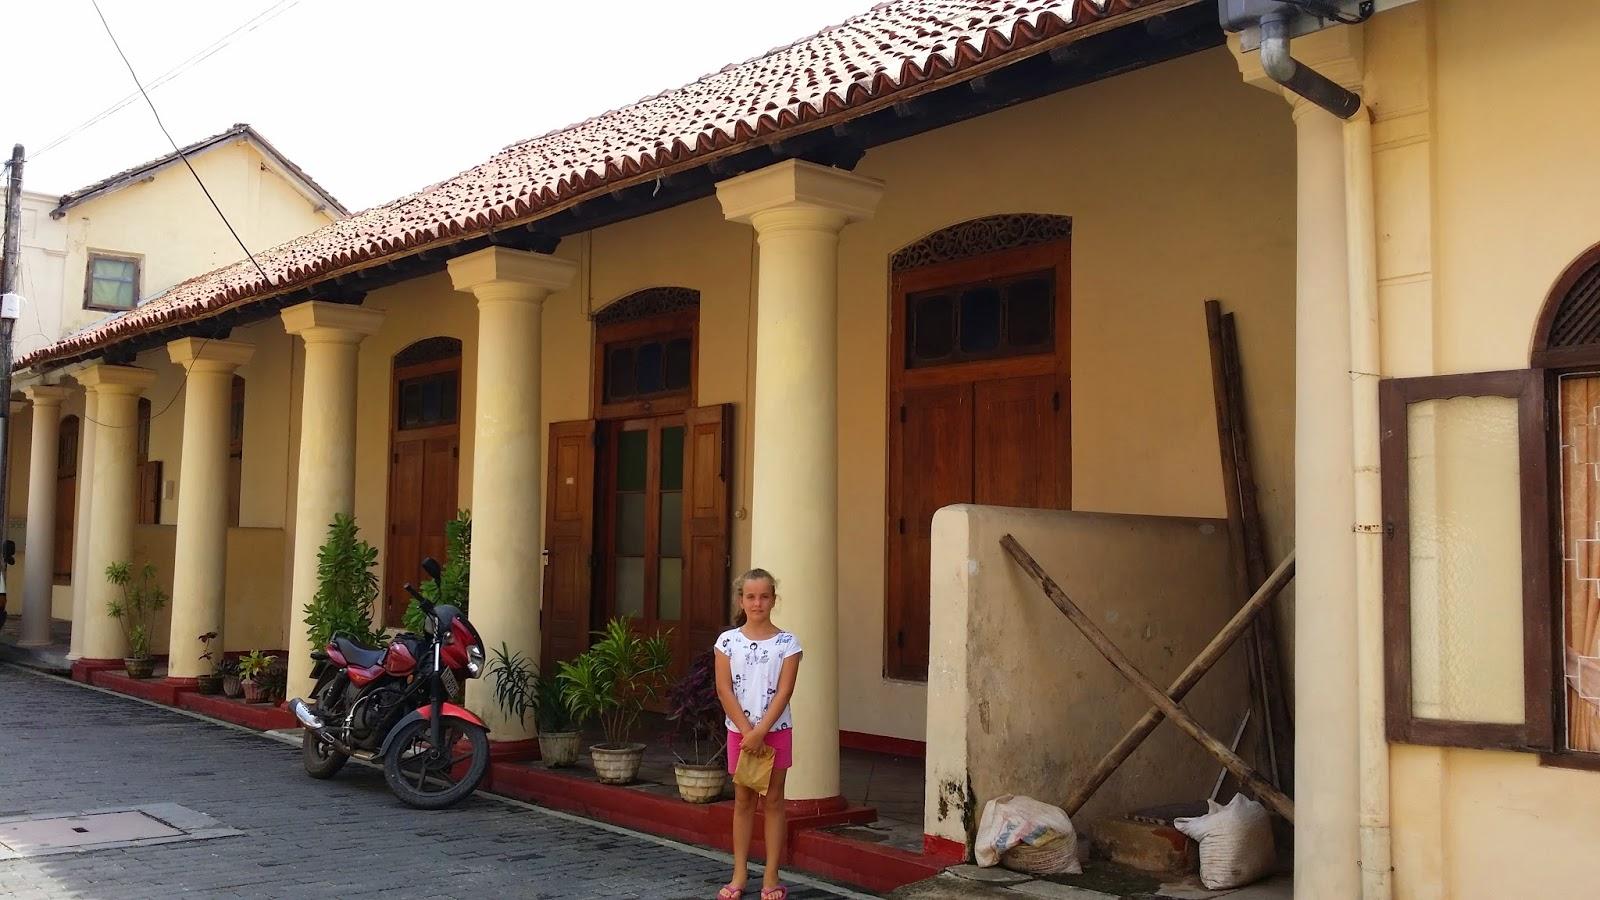 Arquitectura colonial en Galle (Sri Lanka)